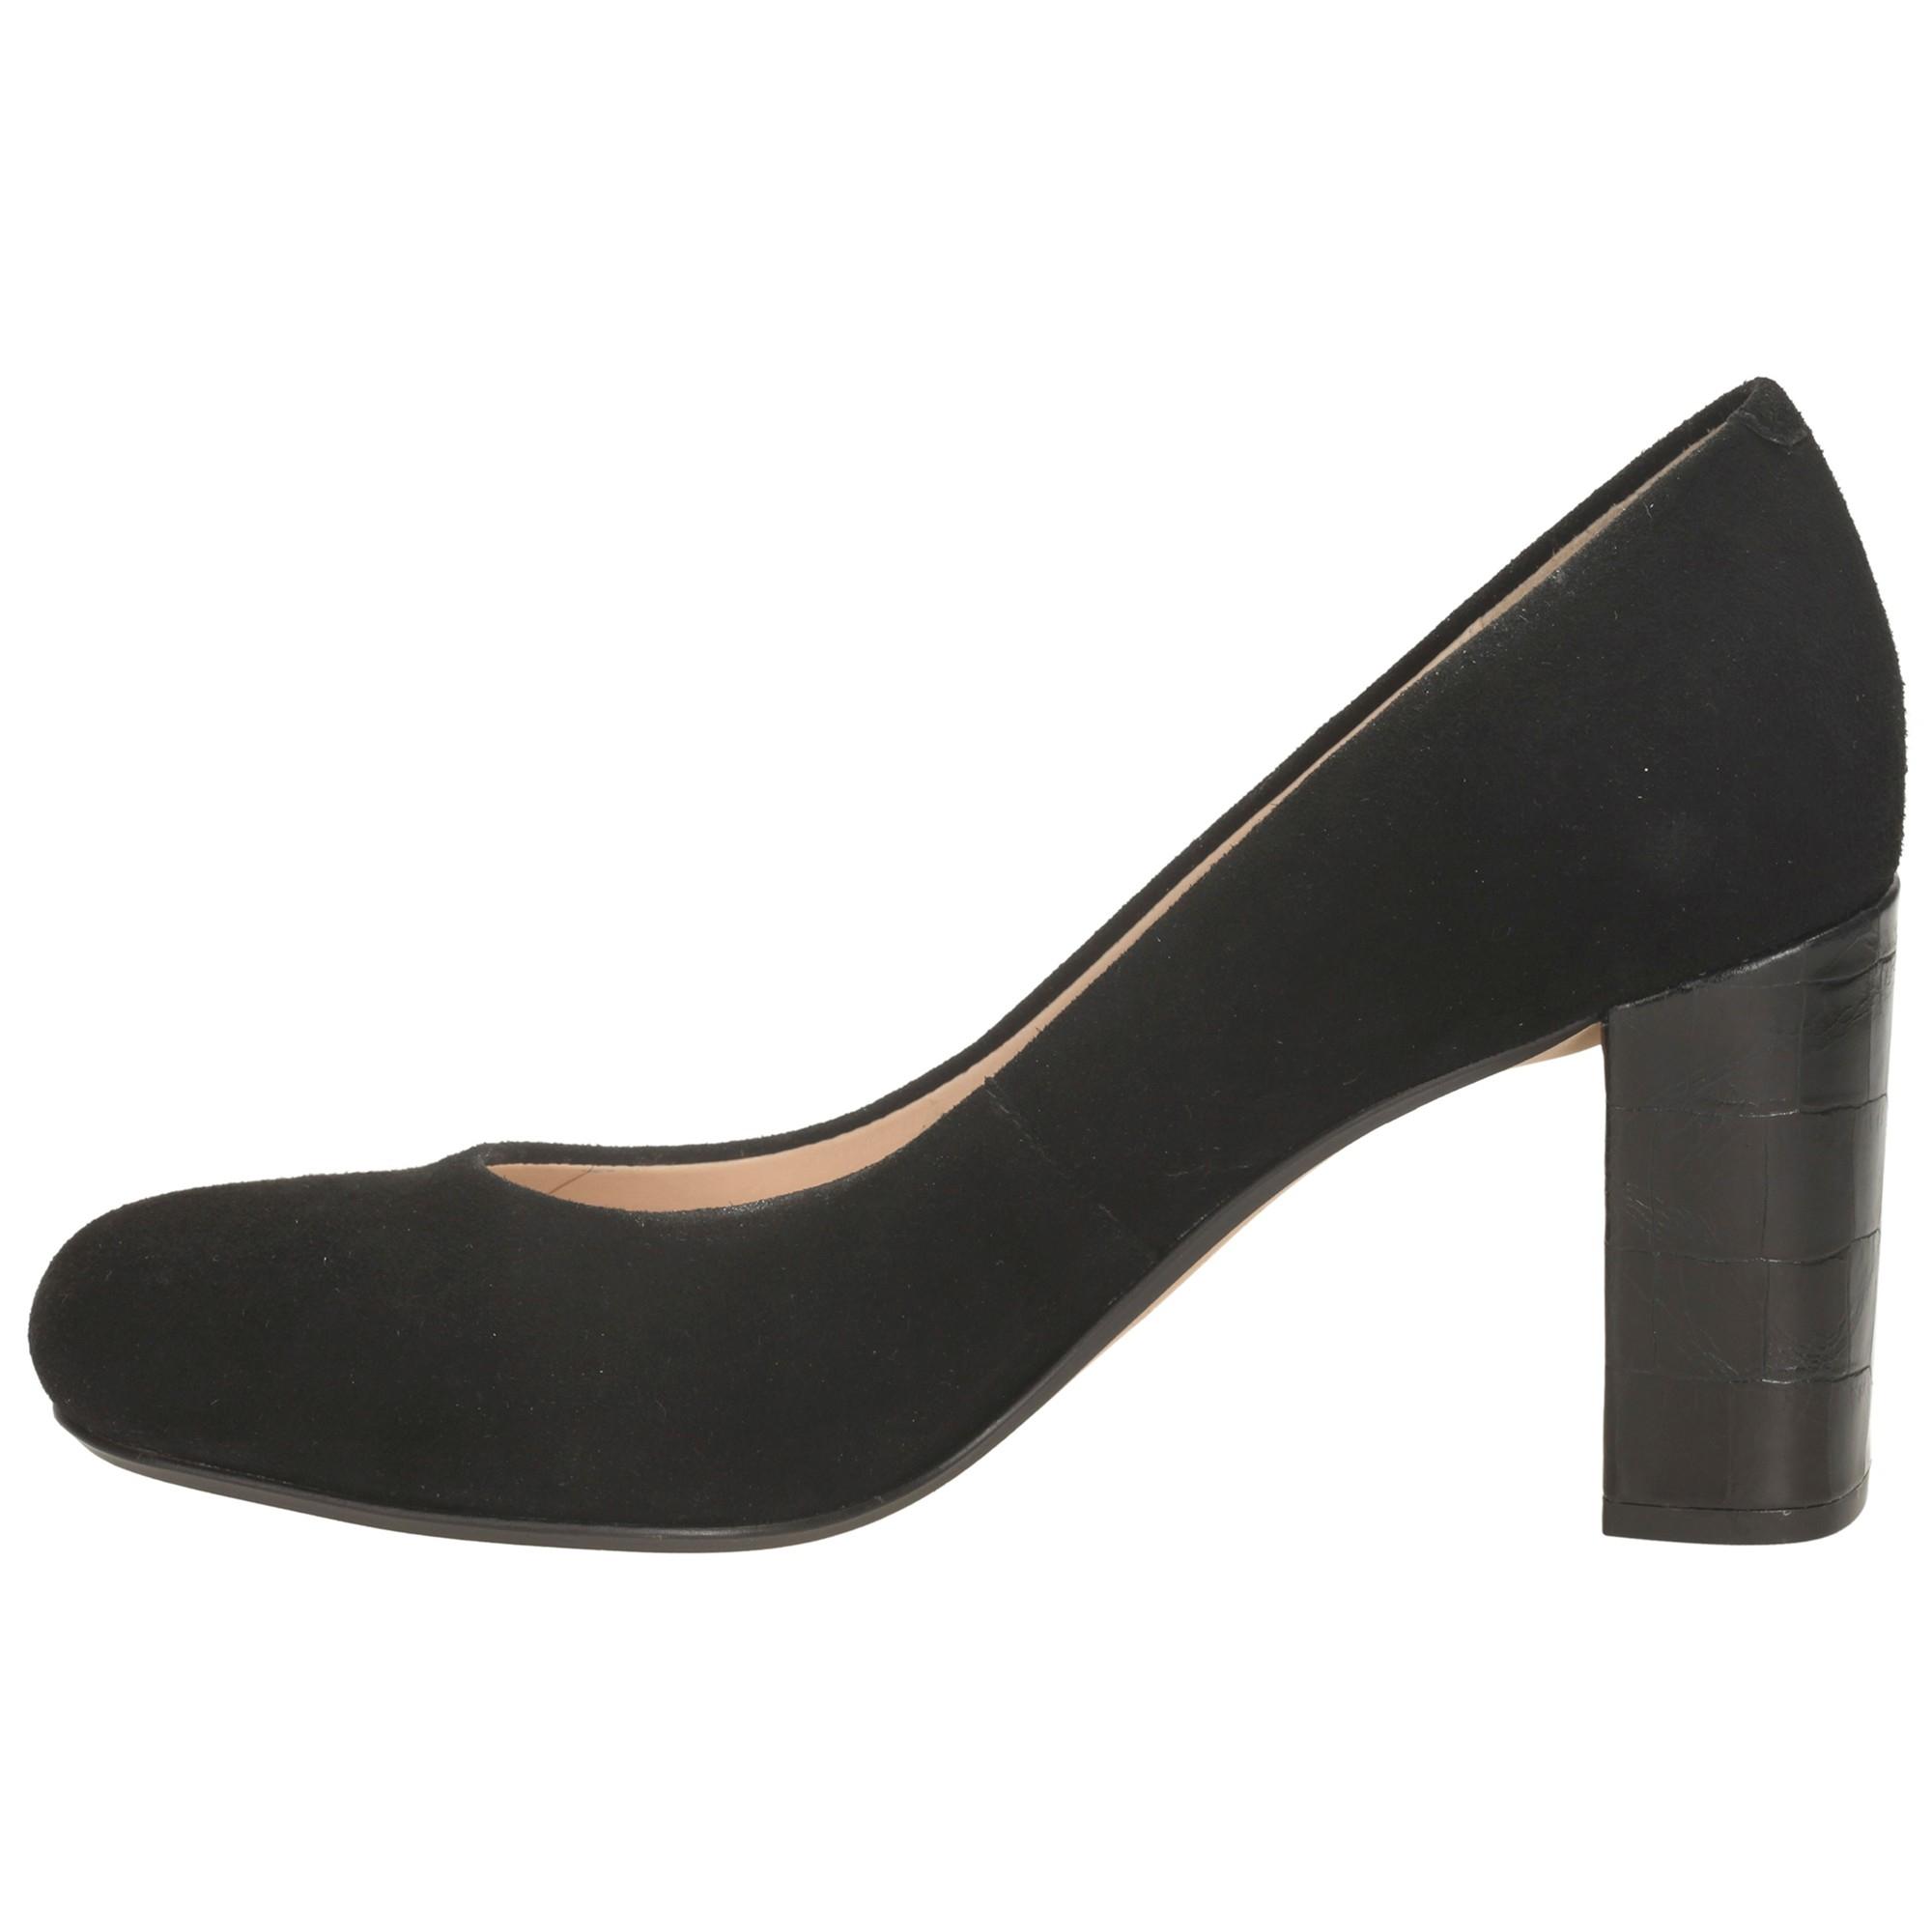 cdc9d136 Clarks Gabriel Mist Block Heel Court Shoes in Black - Lyst